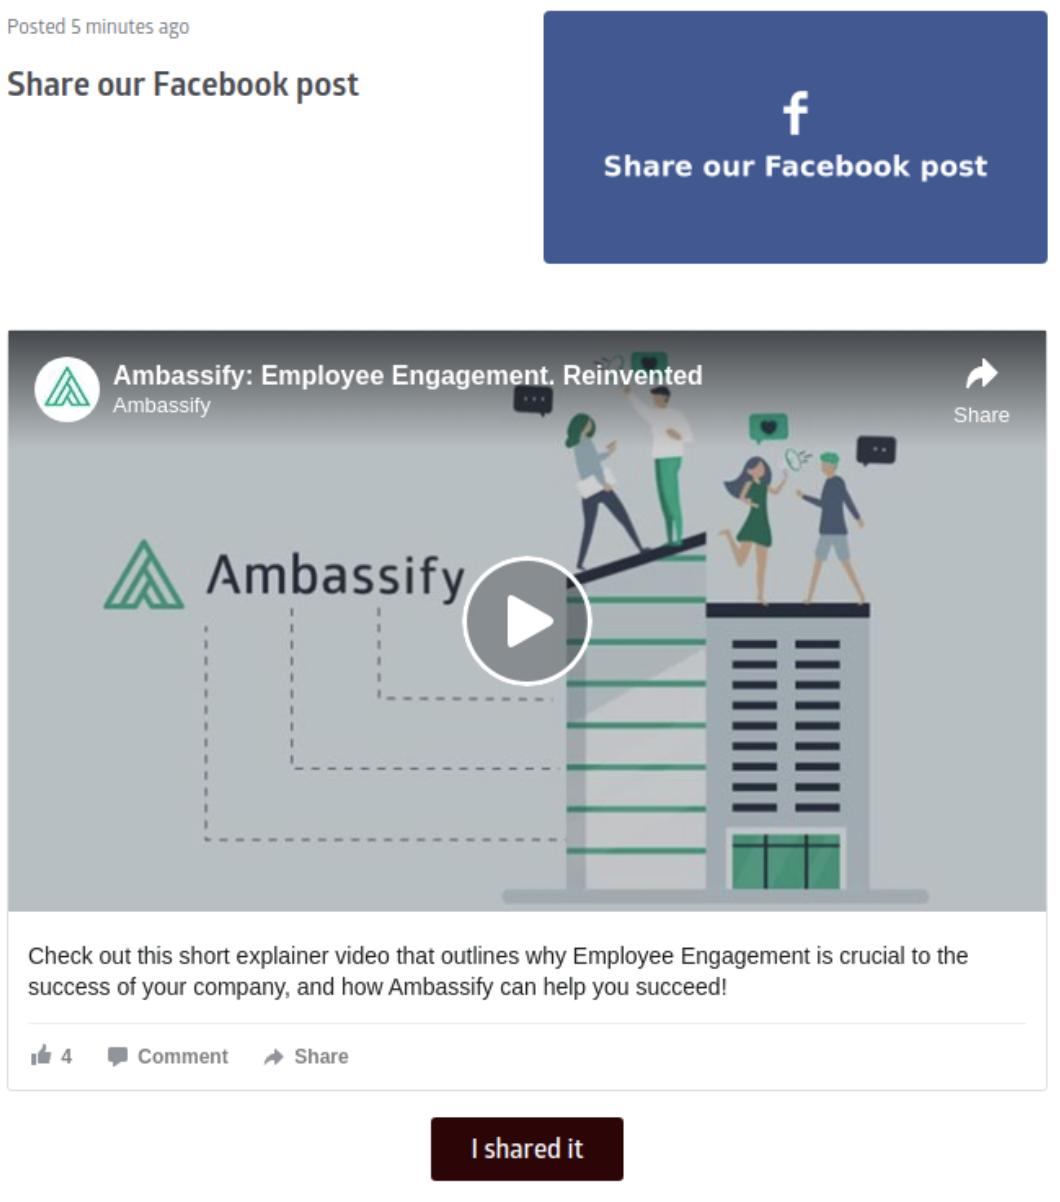 Ambassify_Share_FB_Post